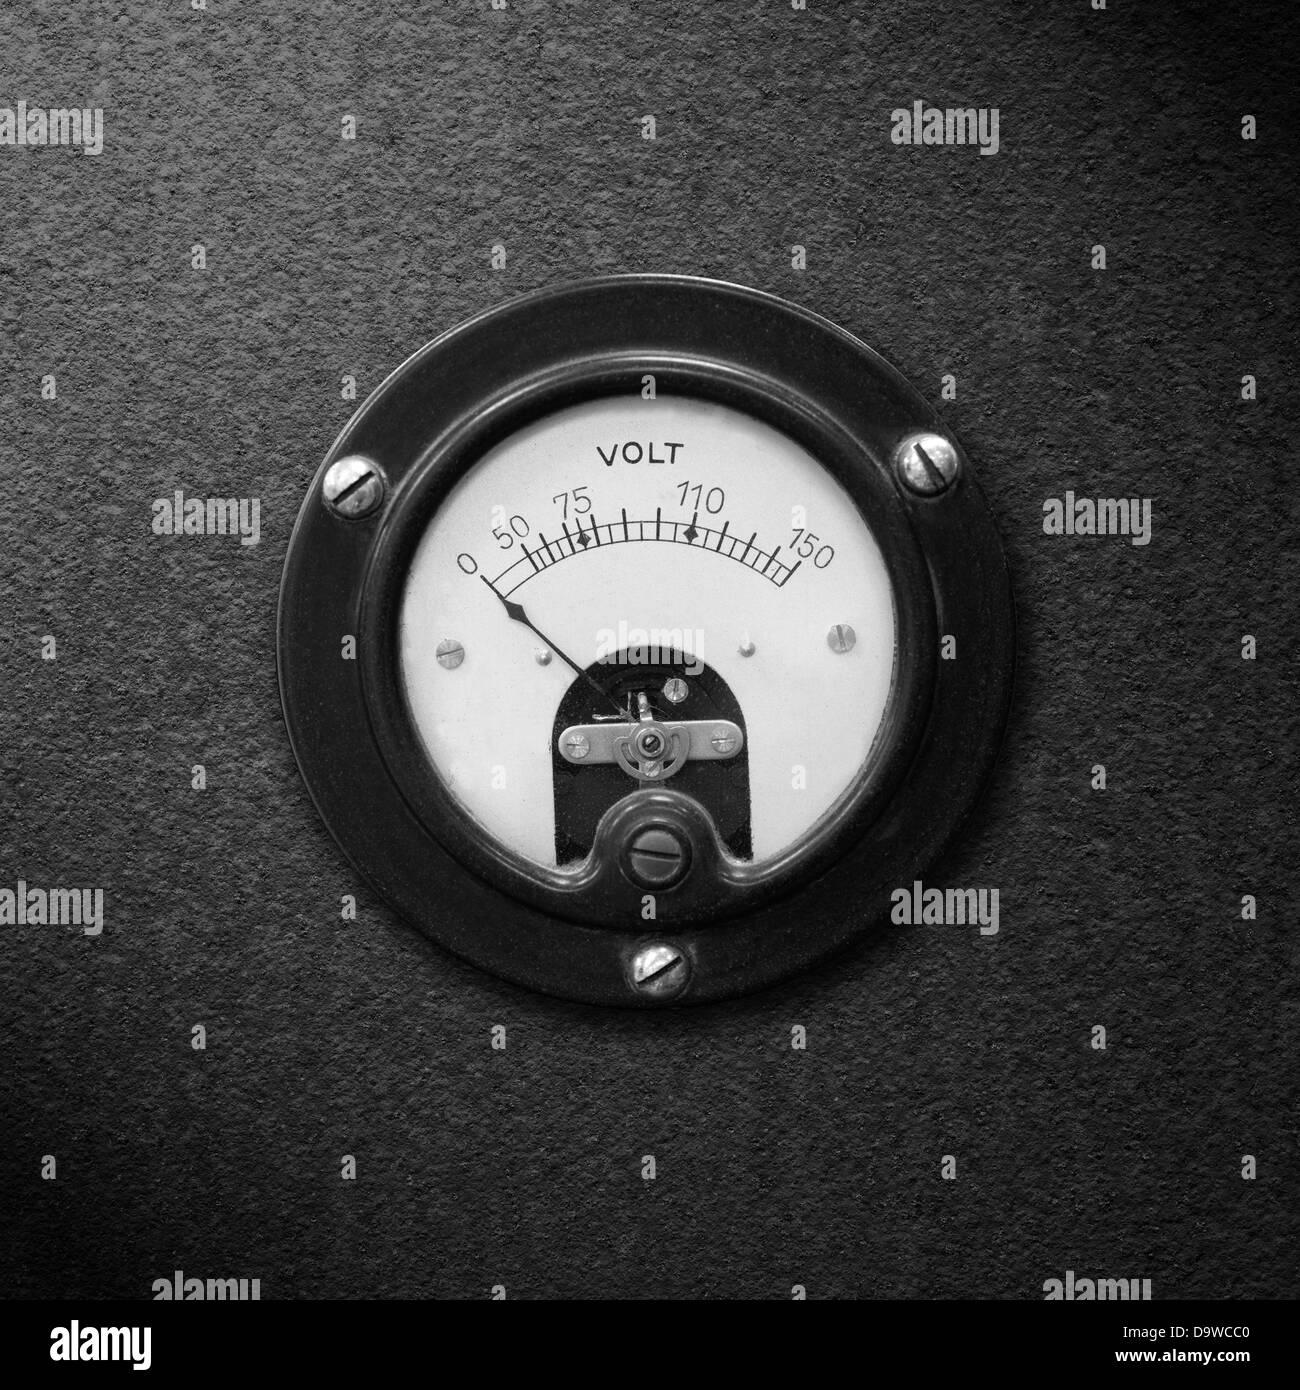 old voltmeter on black metal rough pattern texture or vintage electric measurement - Stock Image